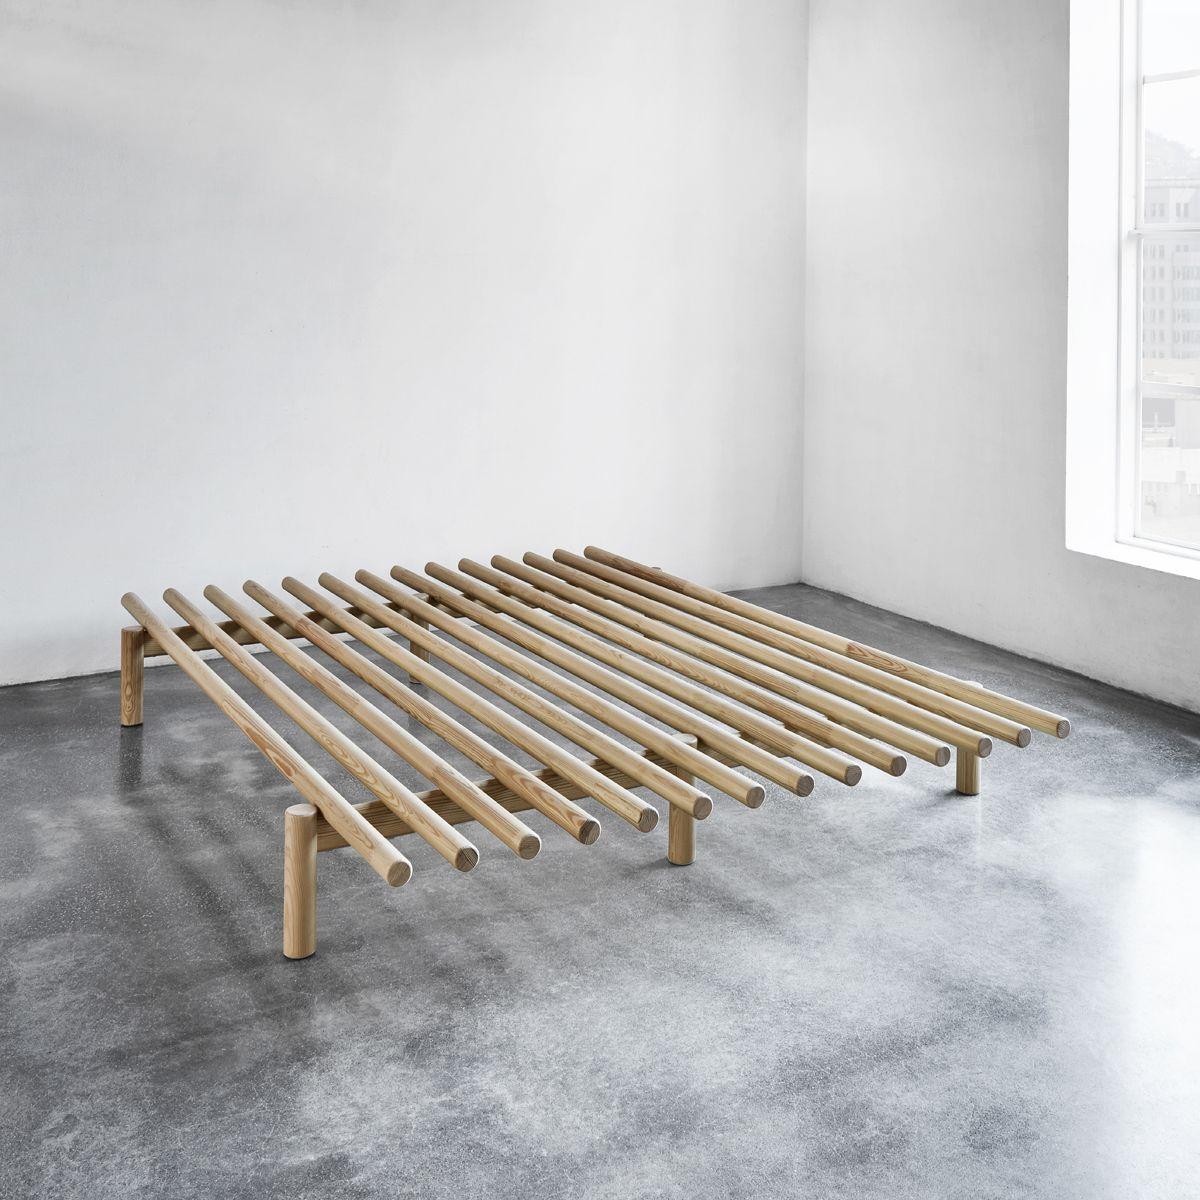 Pace Sengeramme, 160x200, Natur